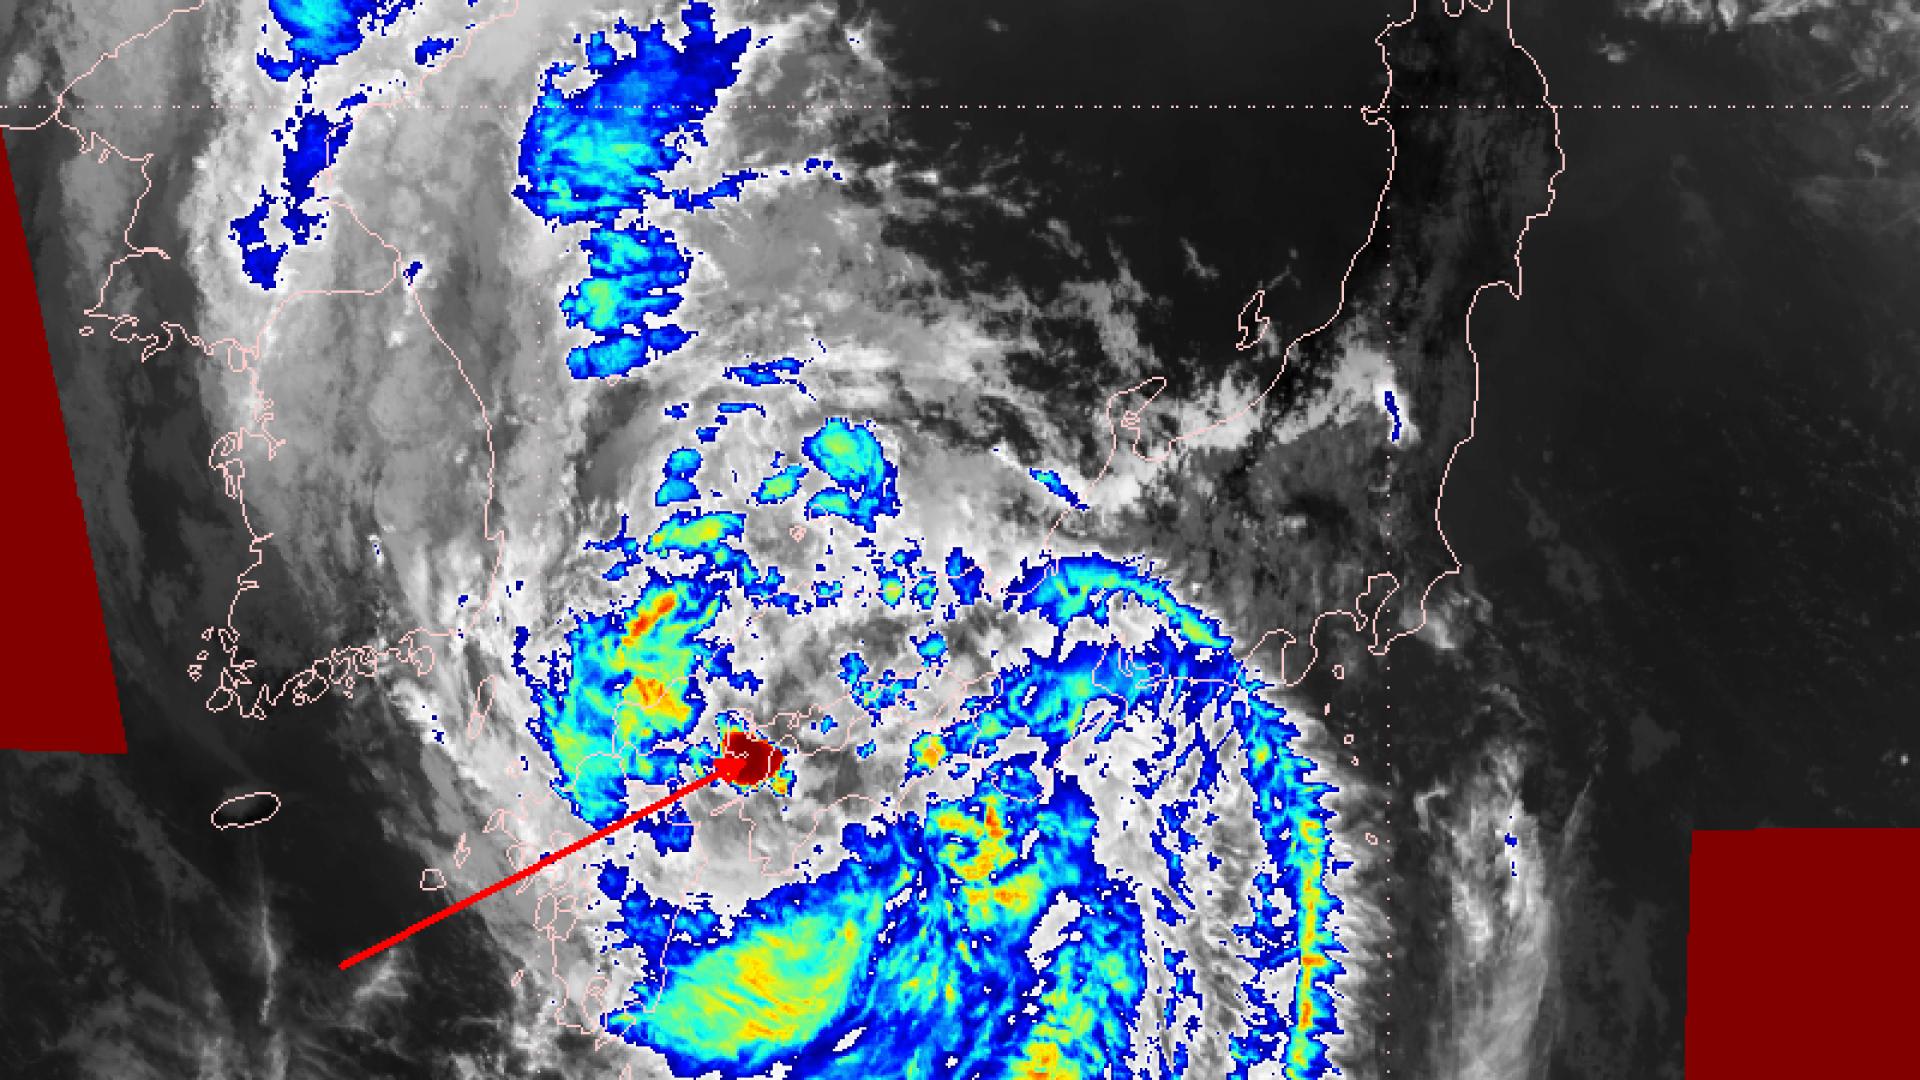 Typhoon Krosa over Japan